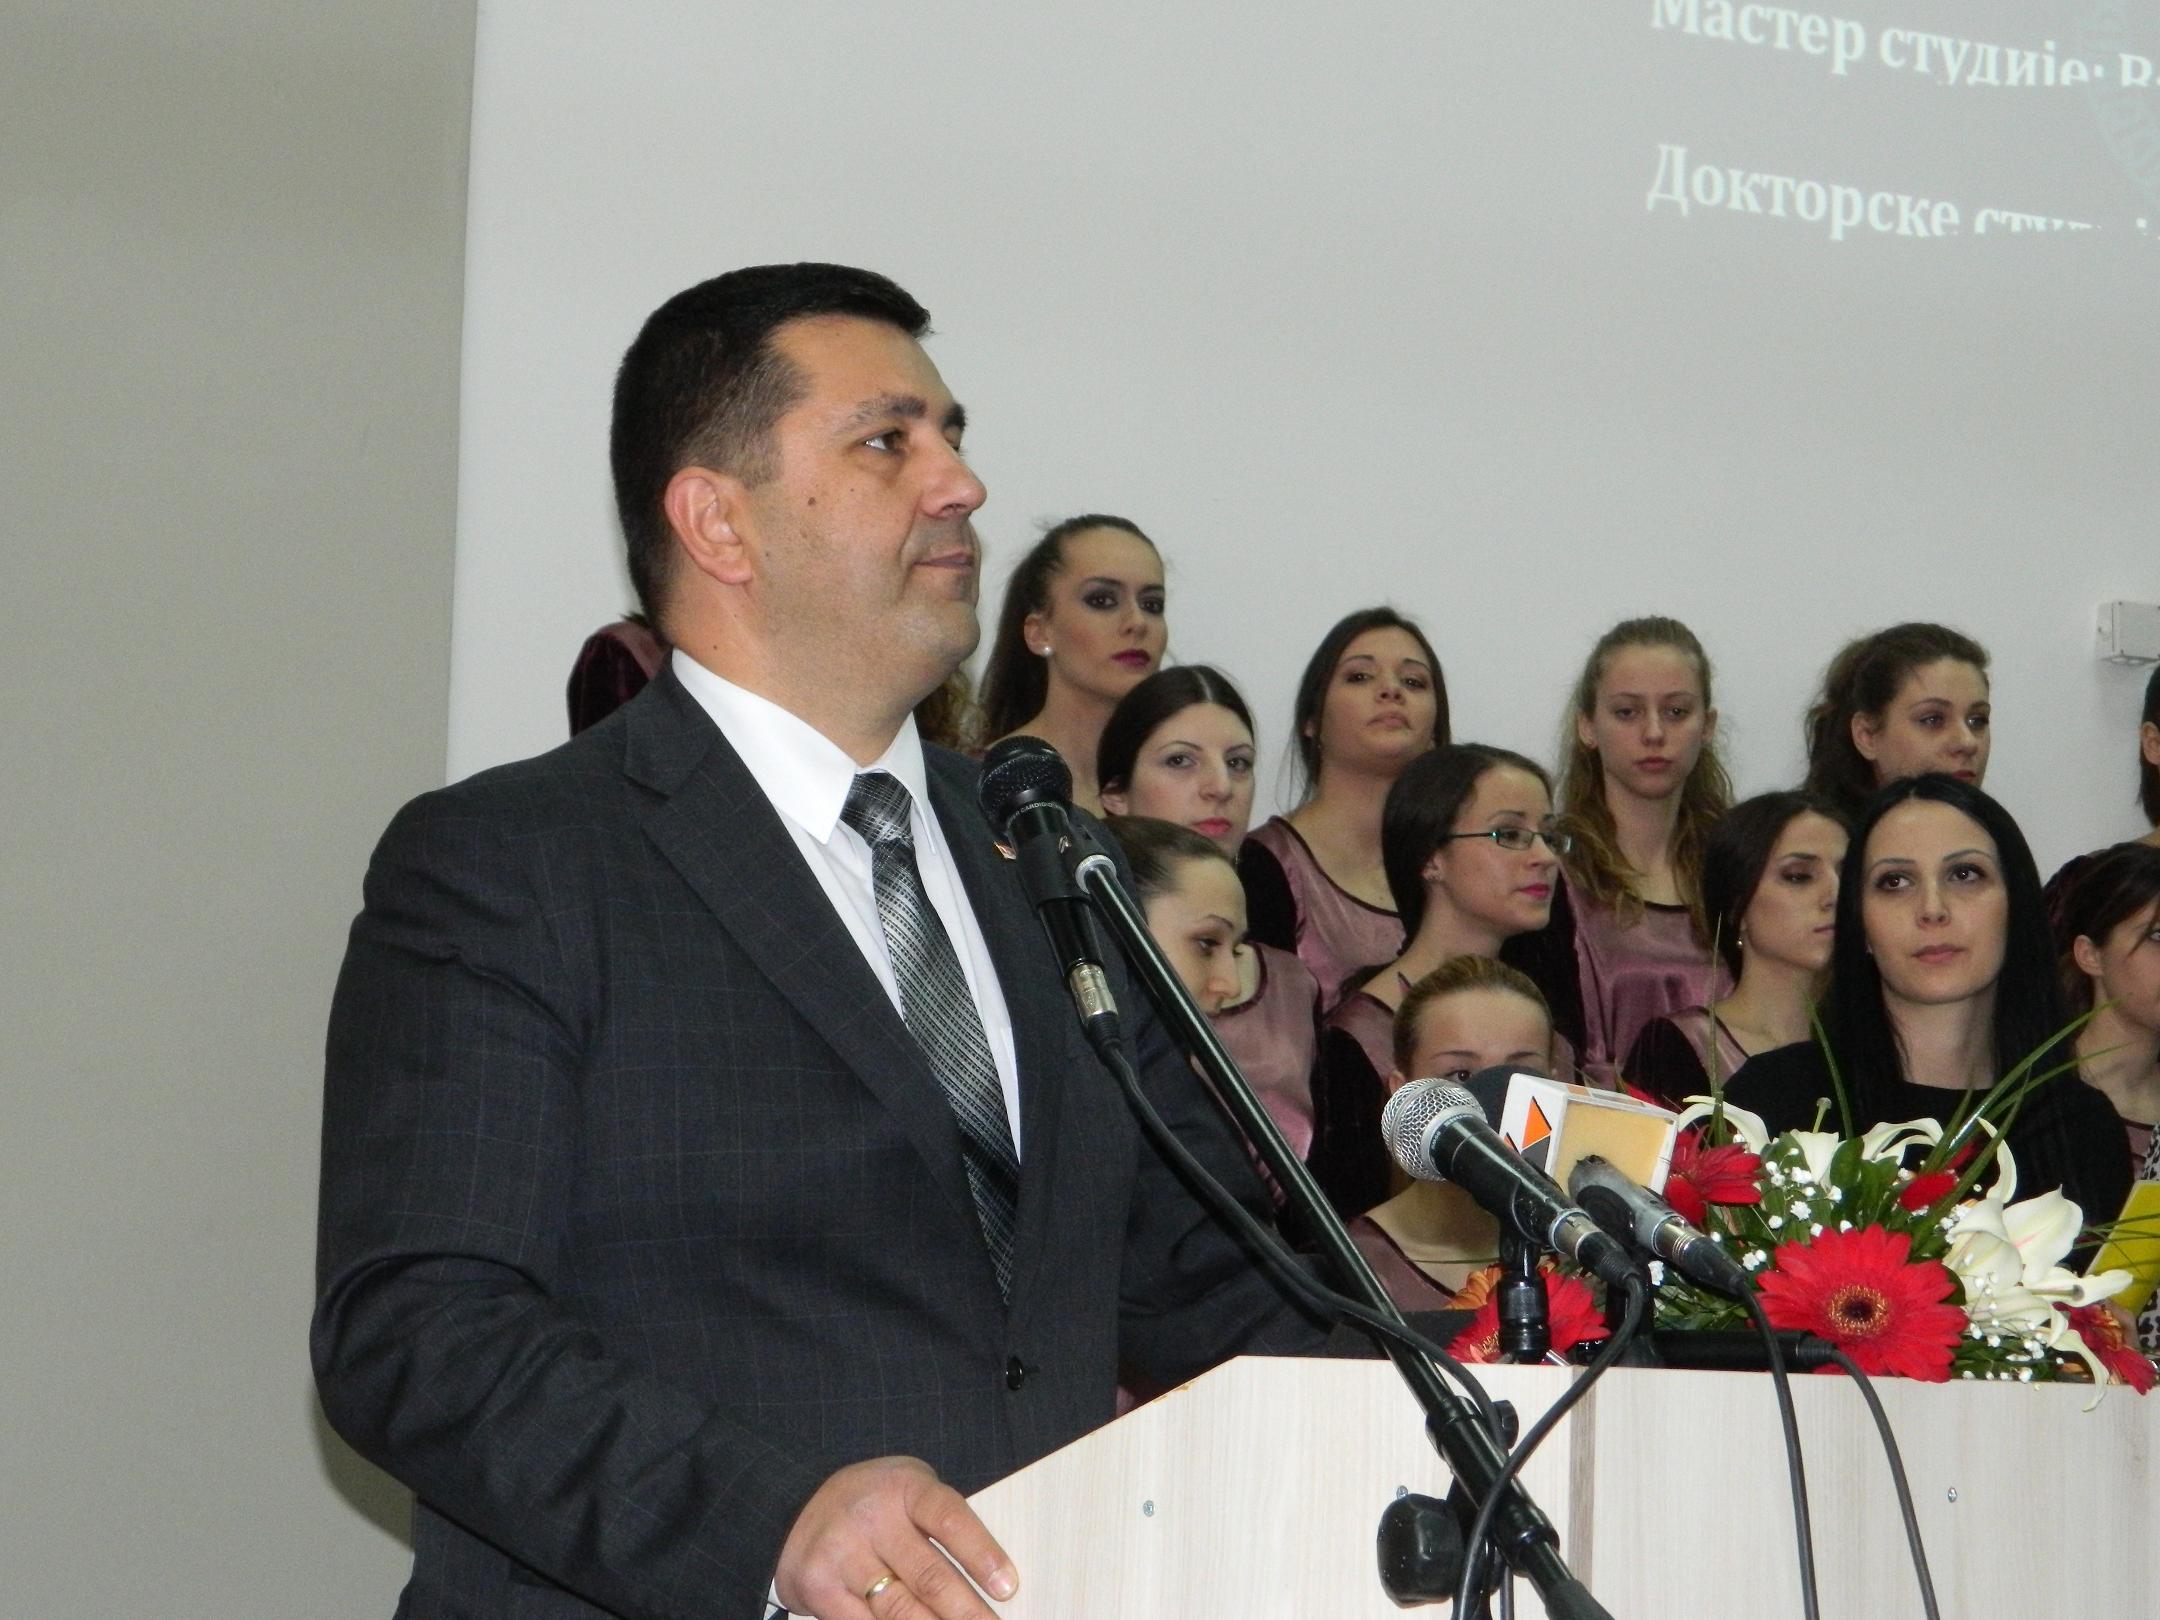 Ljubiša Antonijević